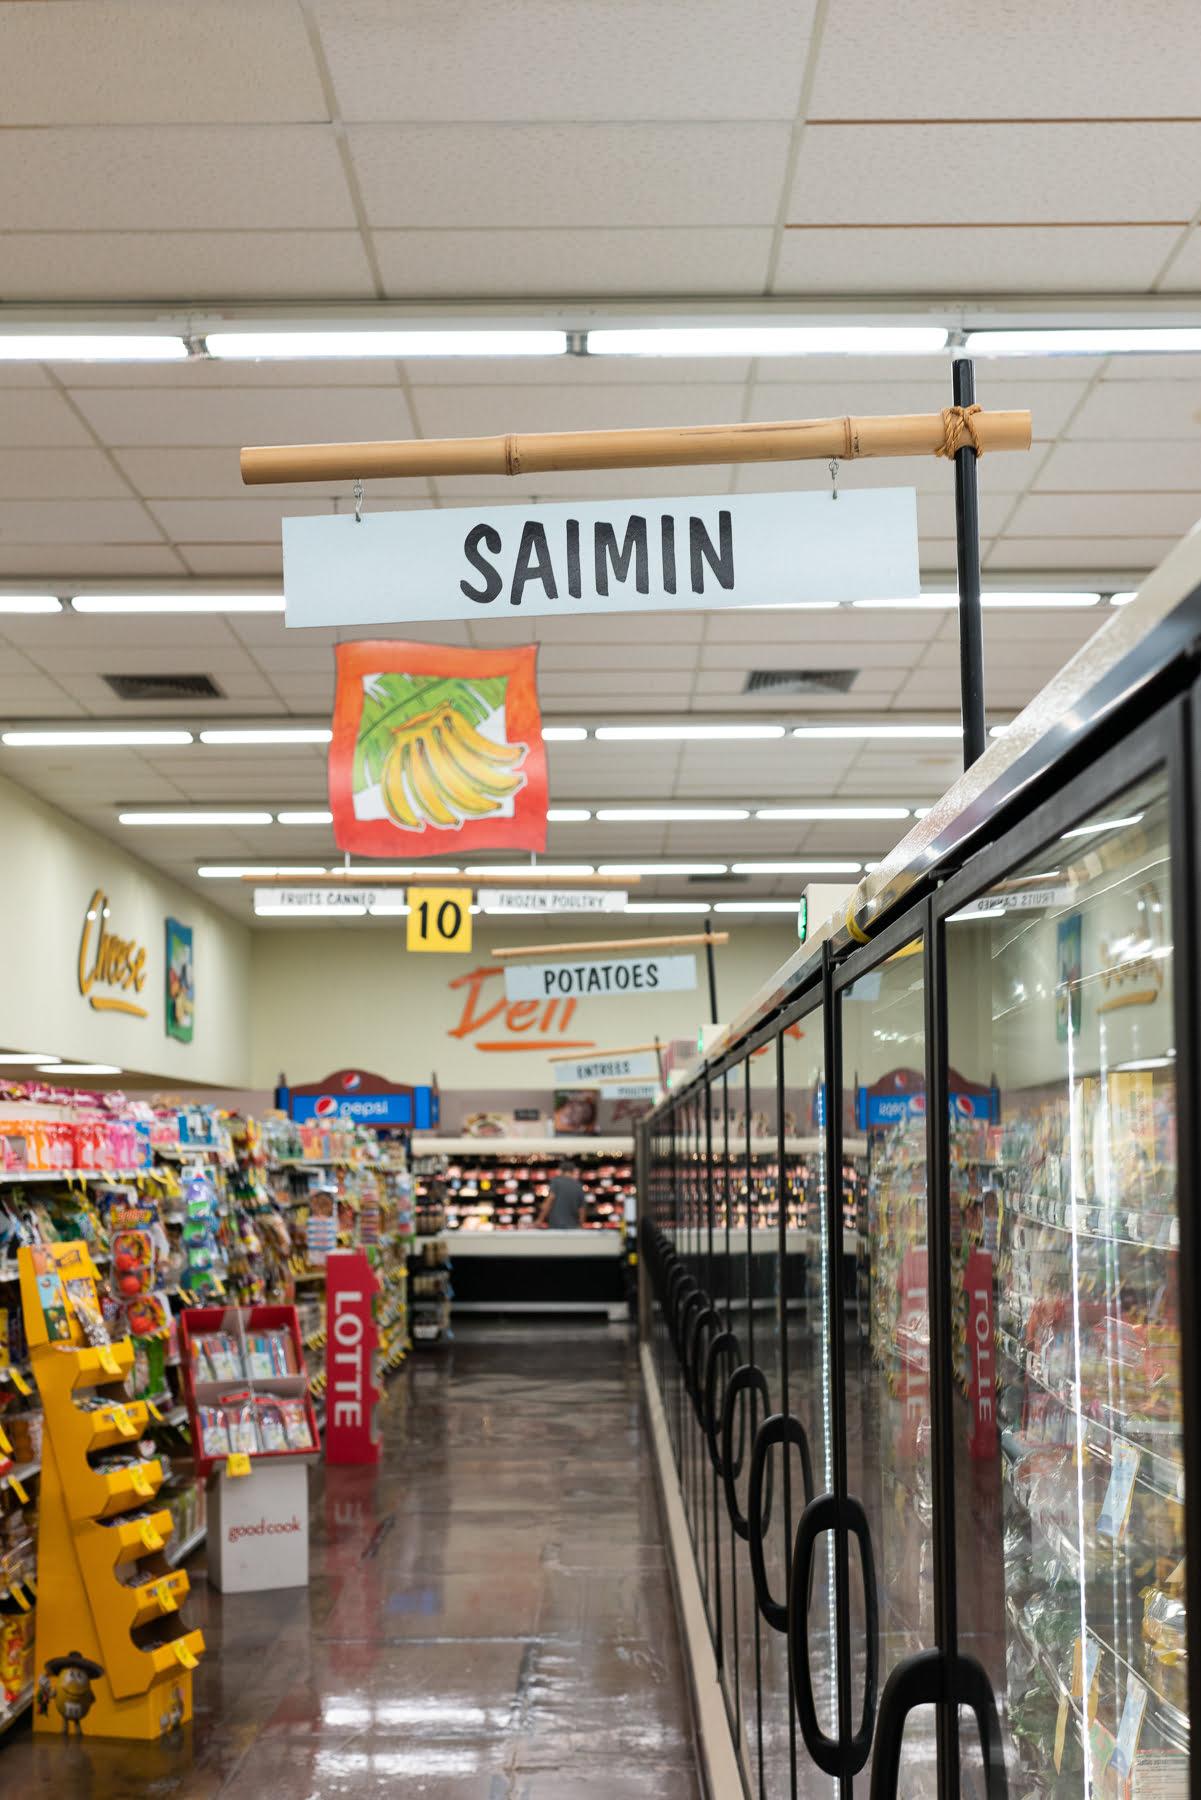 The saimin aisle at Times Supermarket in Honolulu.